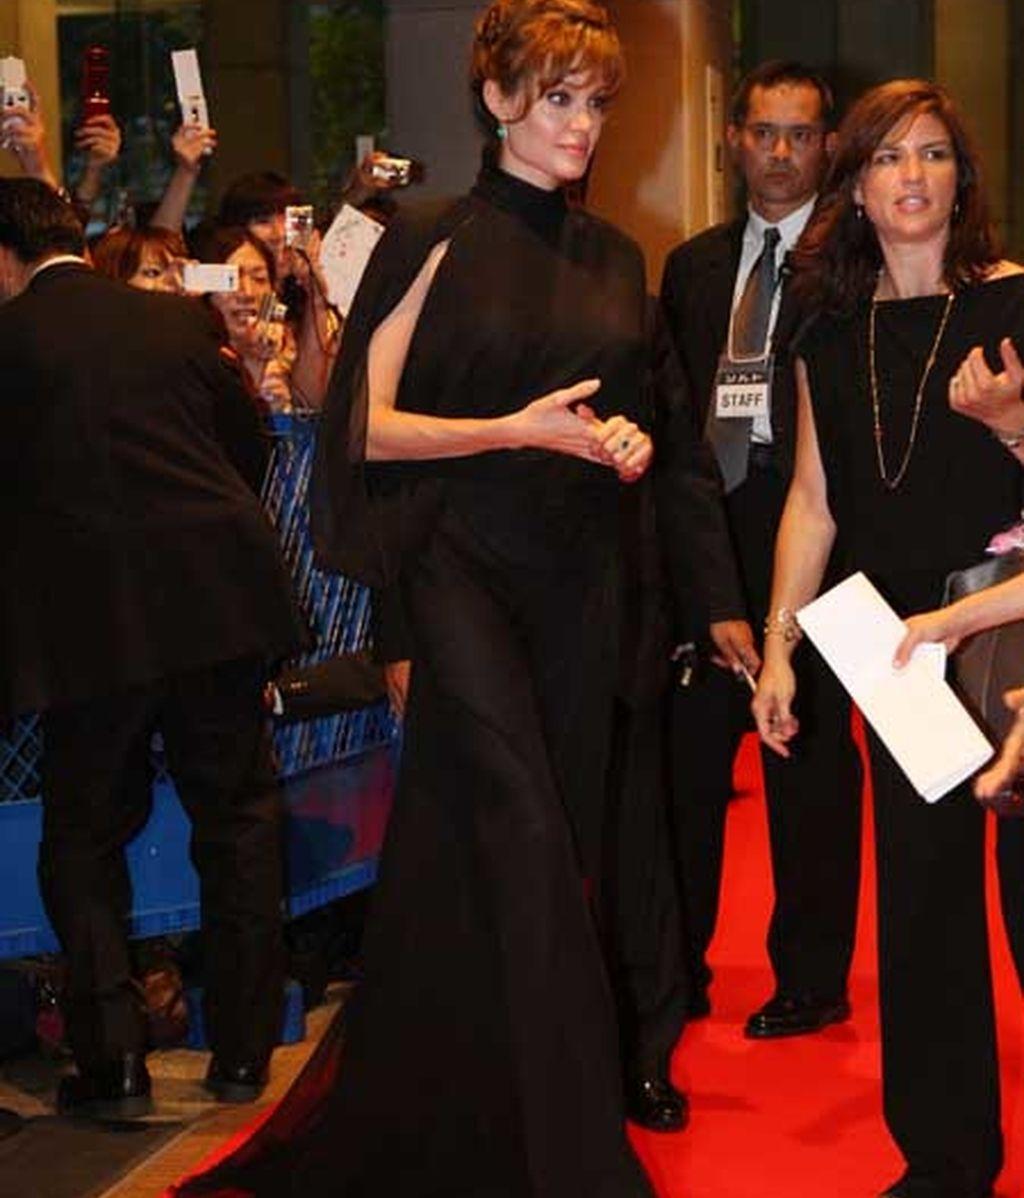 Angelina Jolie, espectacular en la premiere de 'Salt'